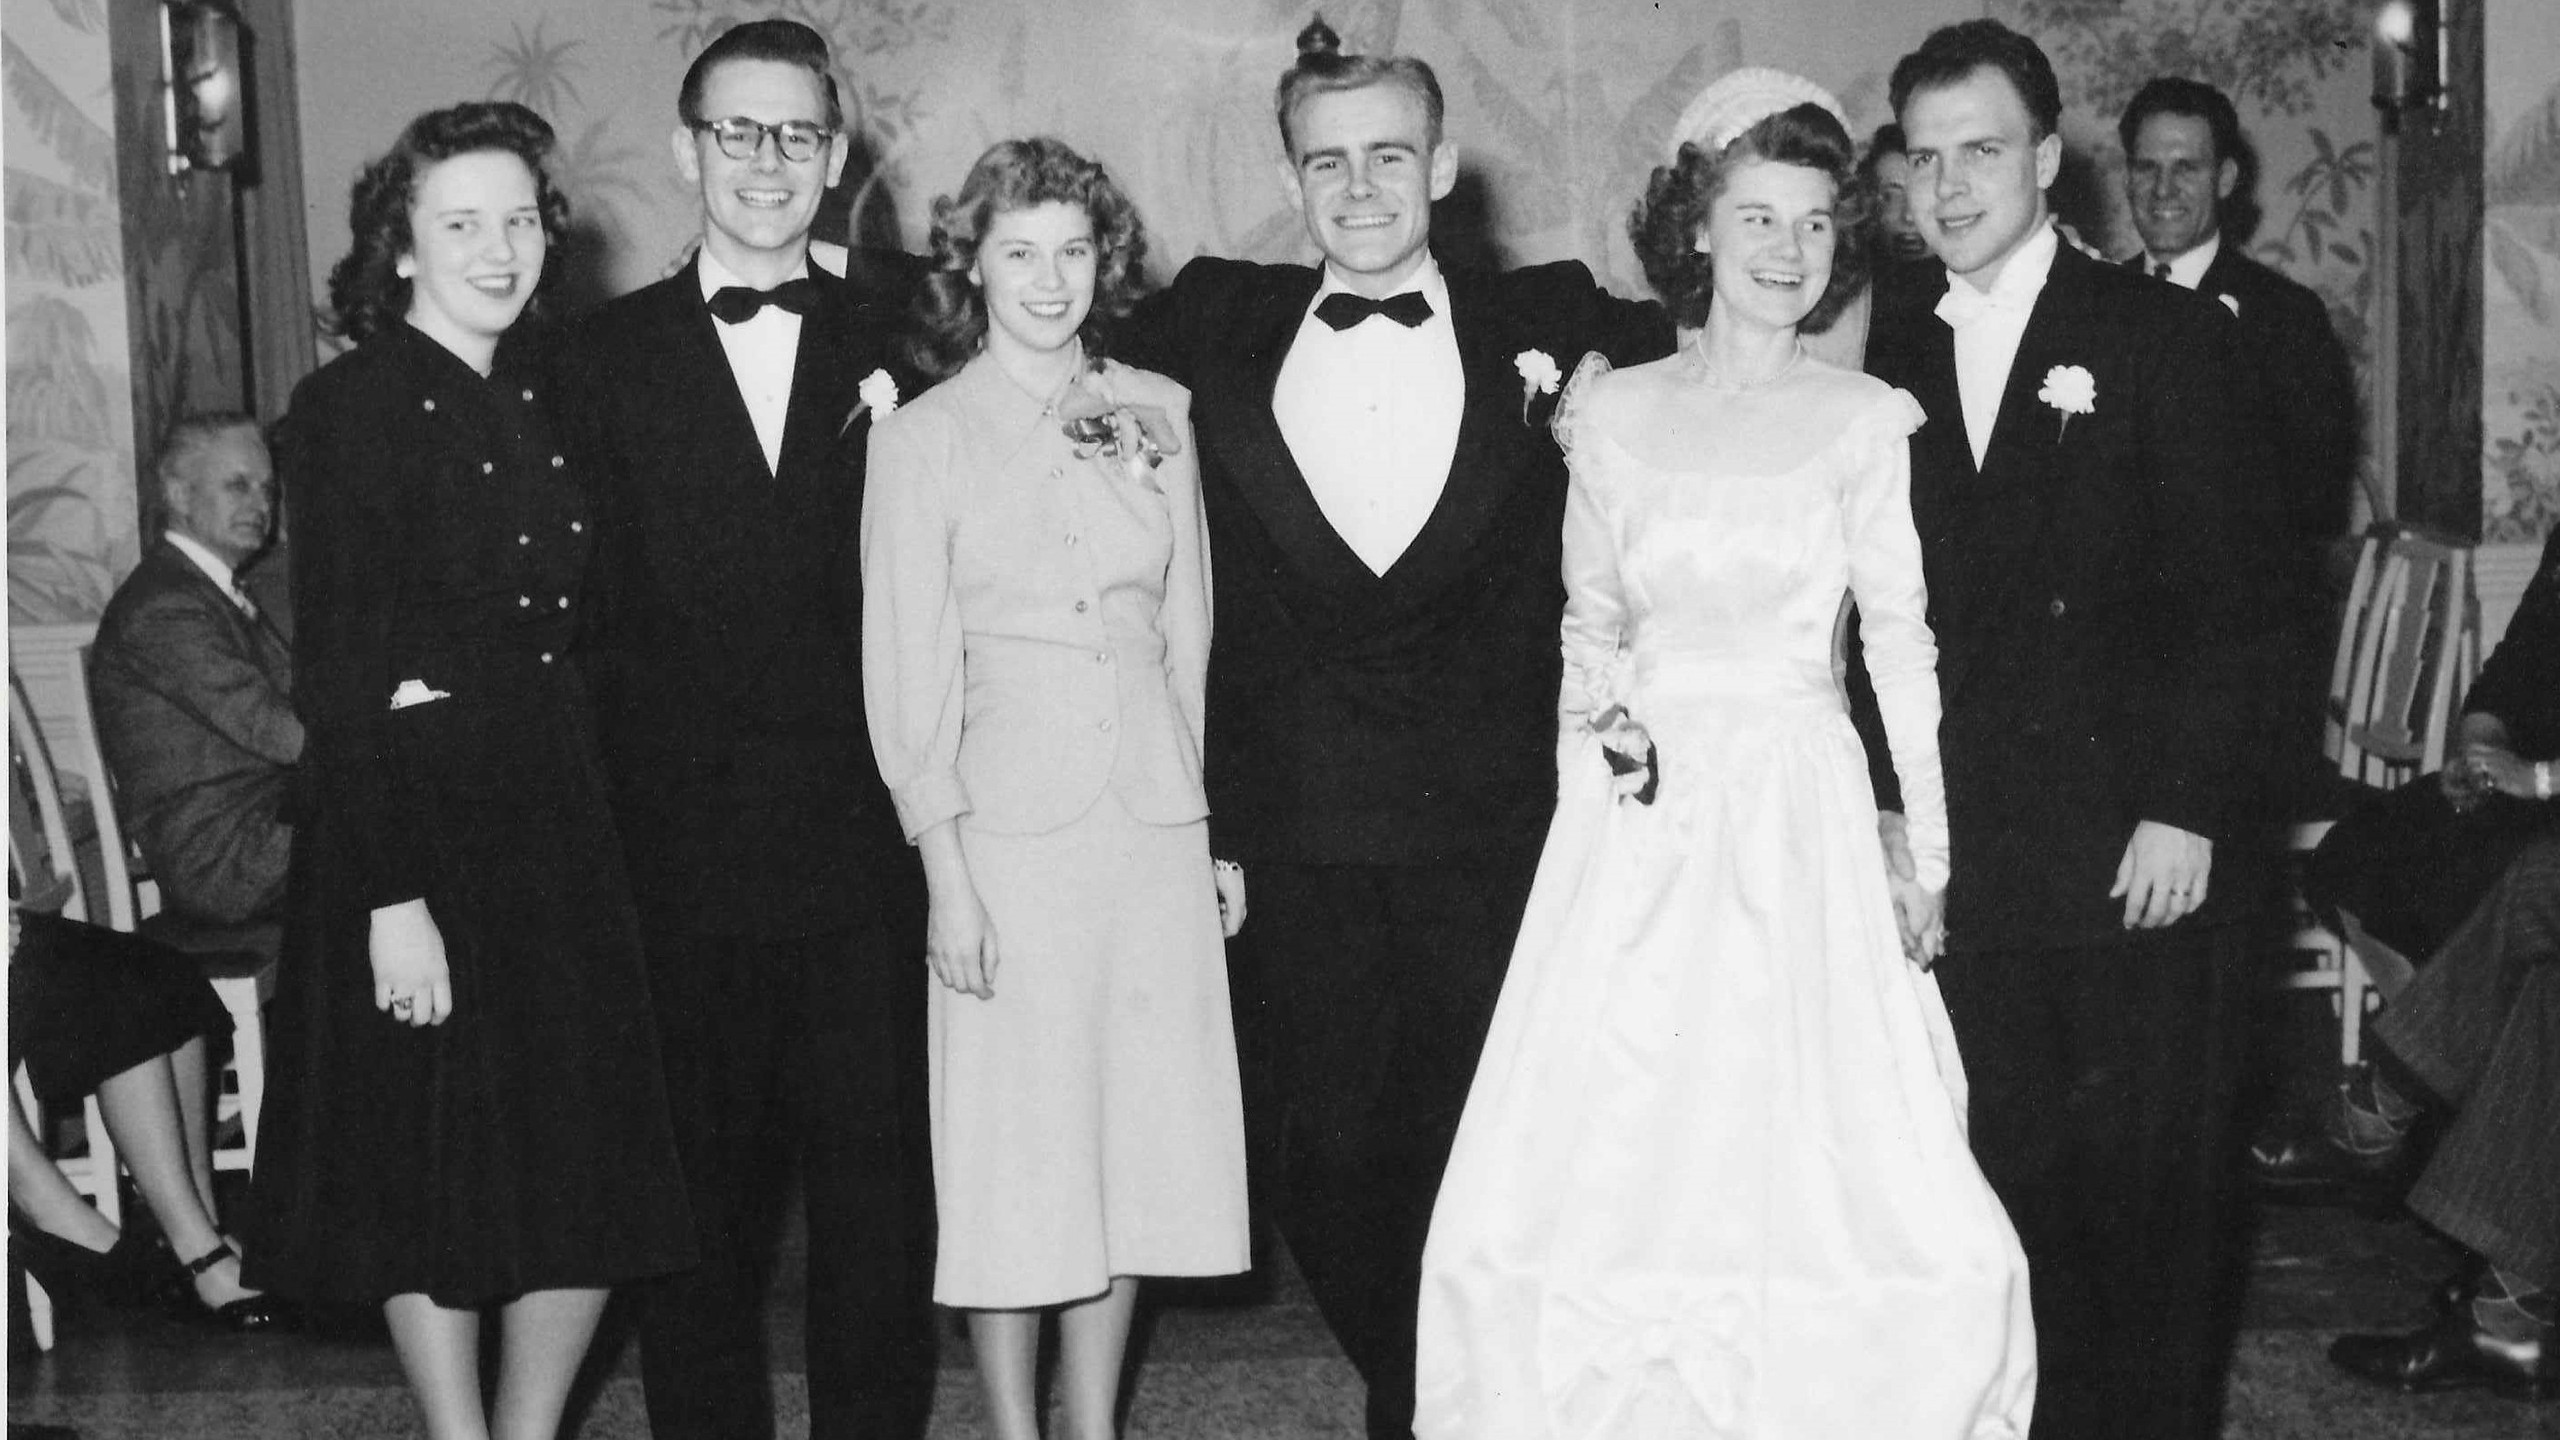 John and Bernice Stiner Wedding Party at